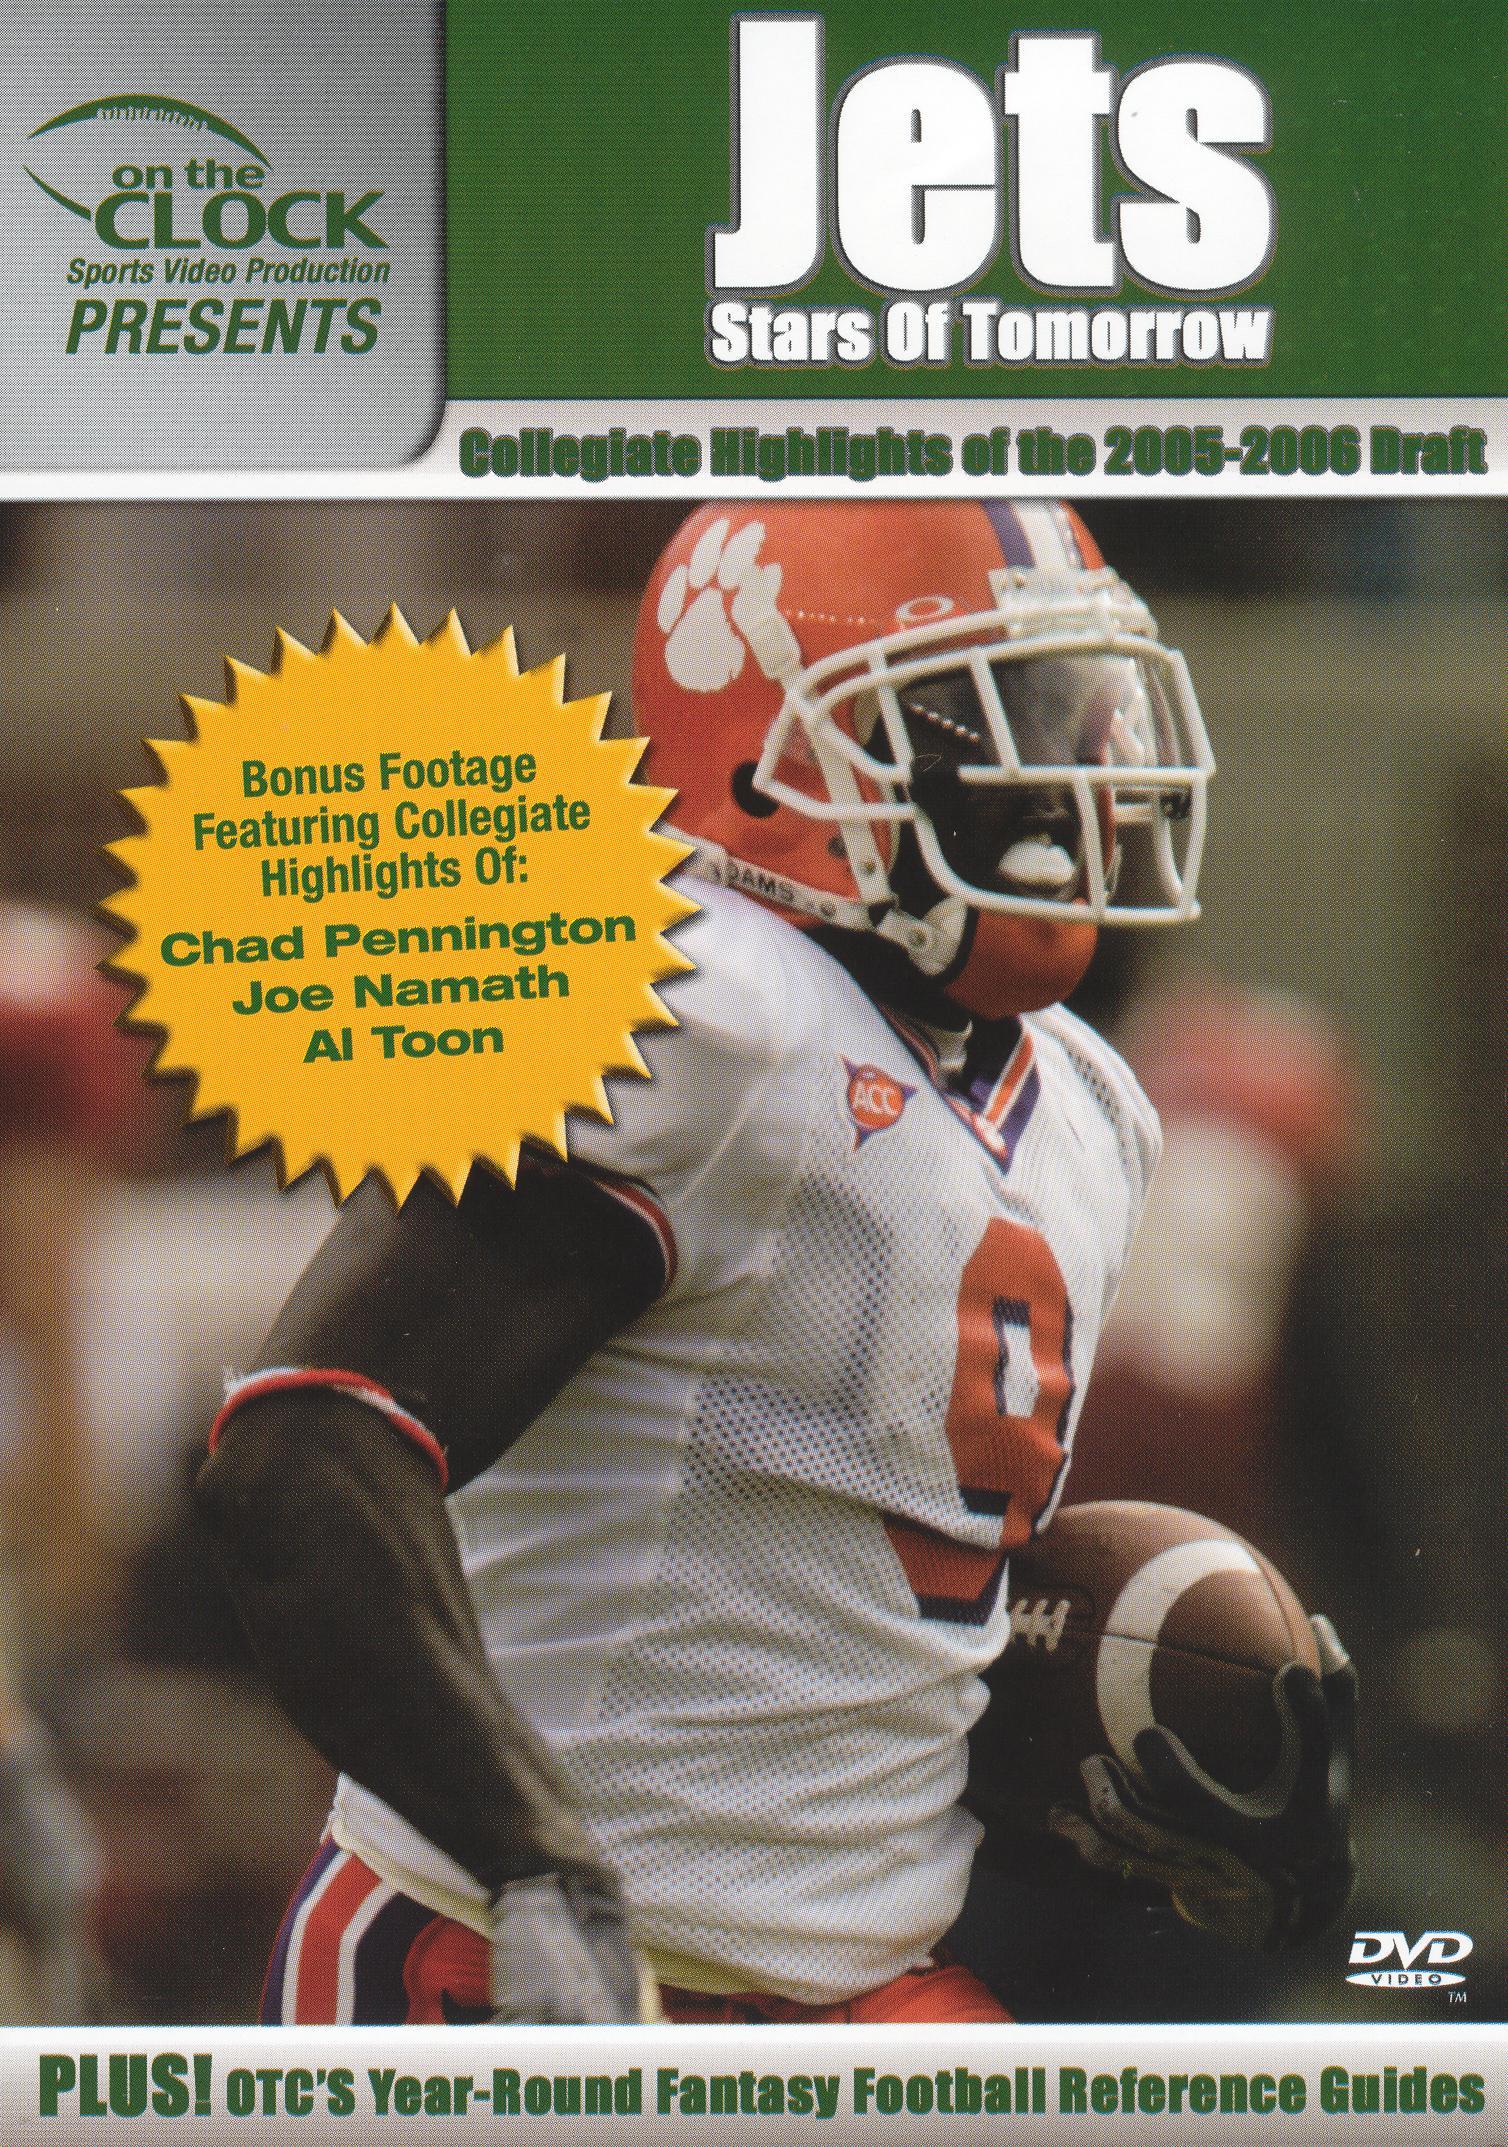 On the Clock Presents: Jets - 2005 Draft Picks Collegiate Highlights